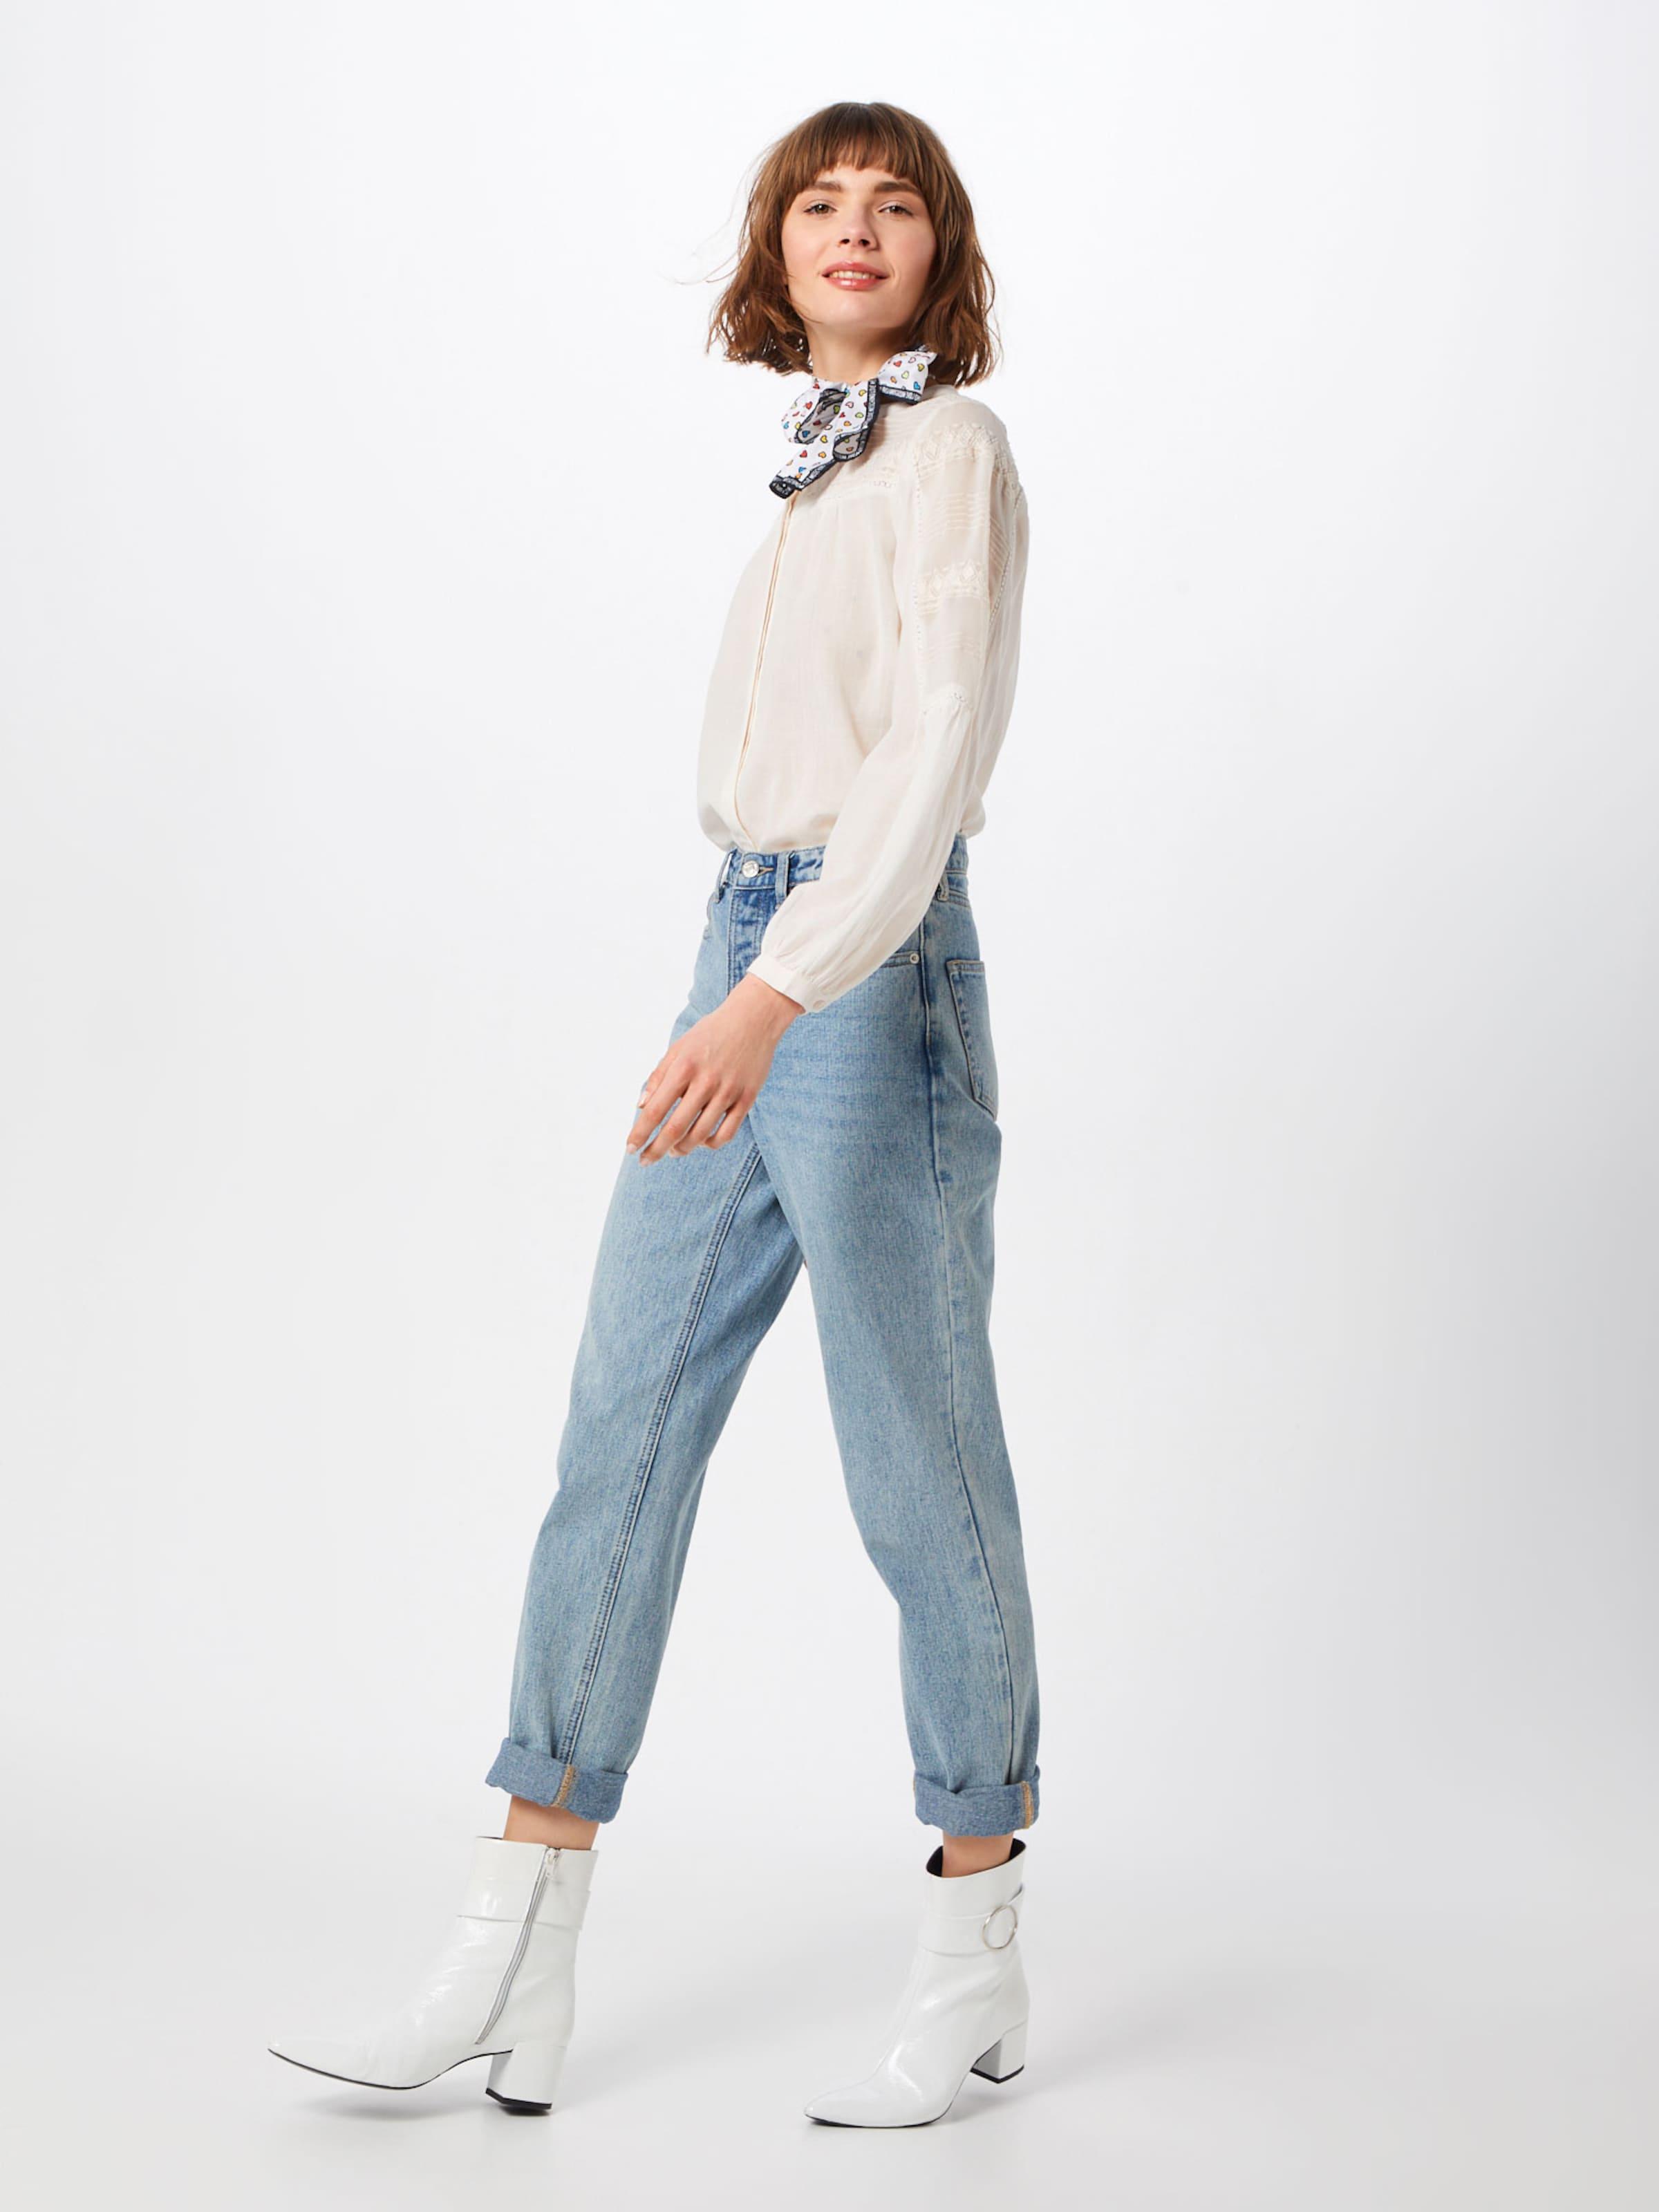 In 'sira' Weiß Pepe Jeans Bluse drhtQsCxB